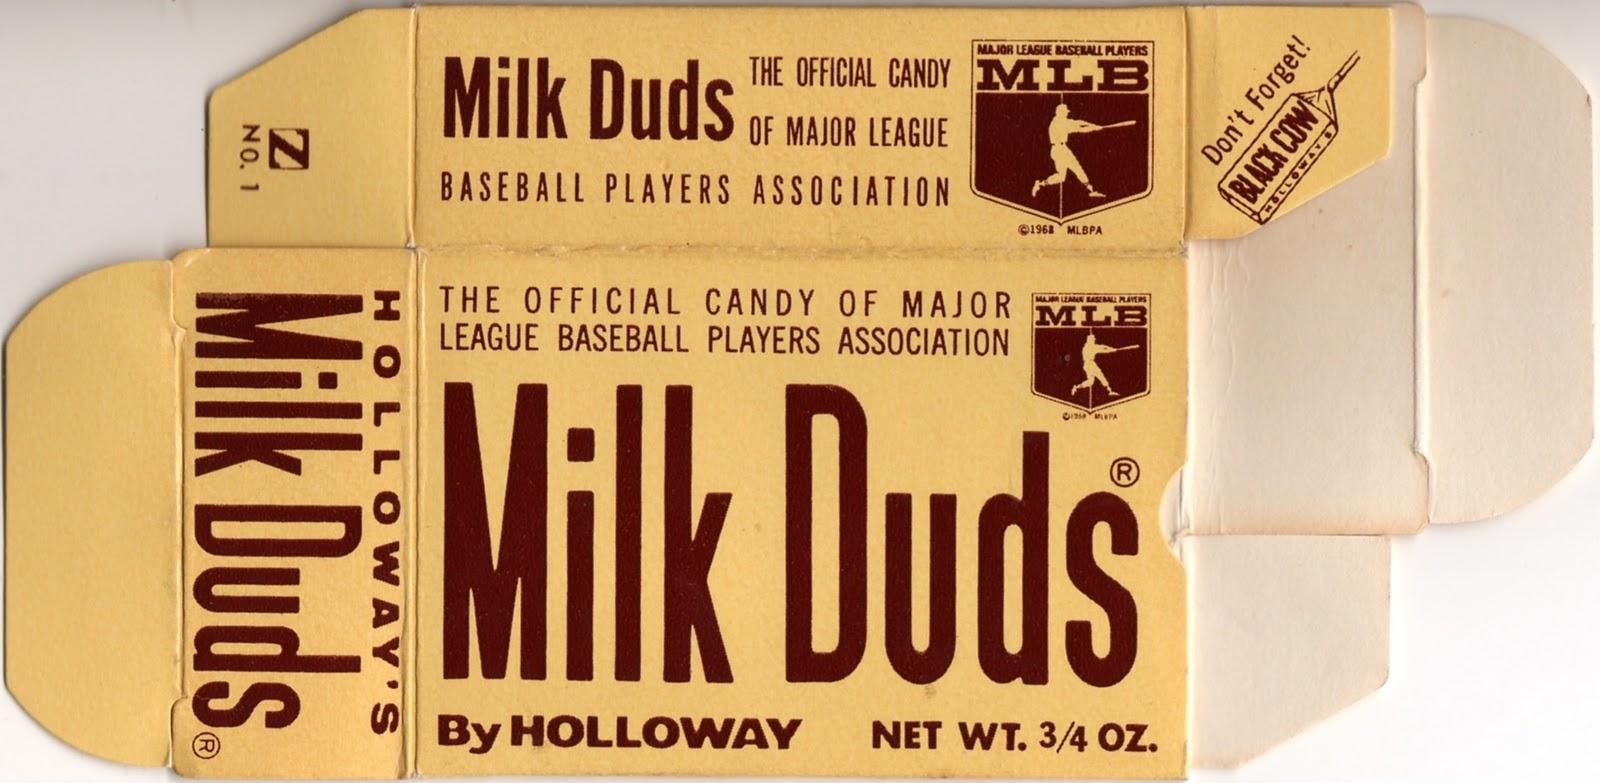 1971_milk_duds_b.jpg